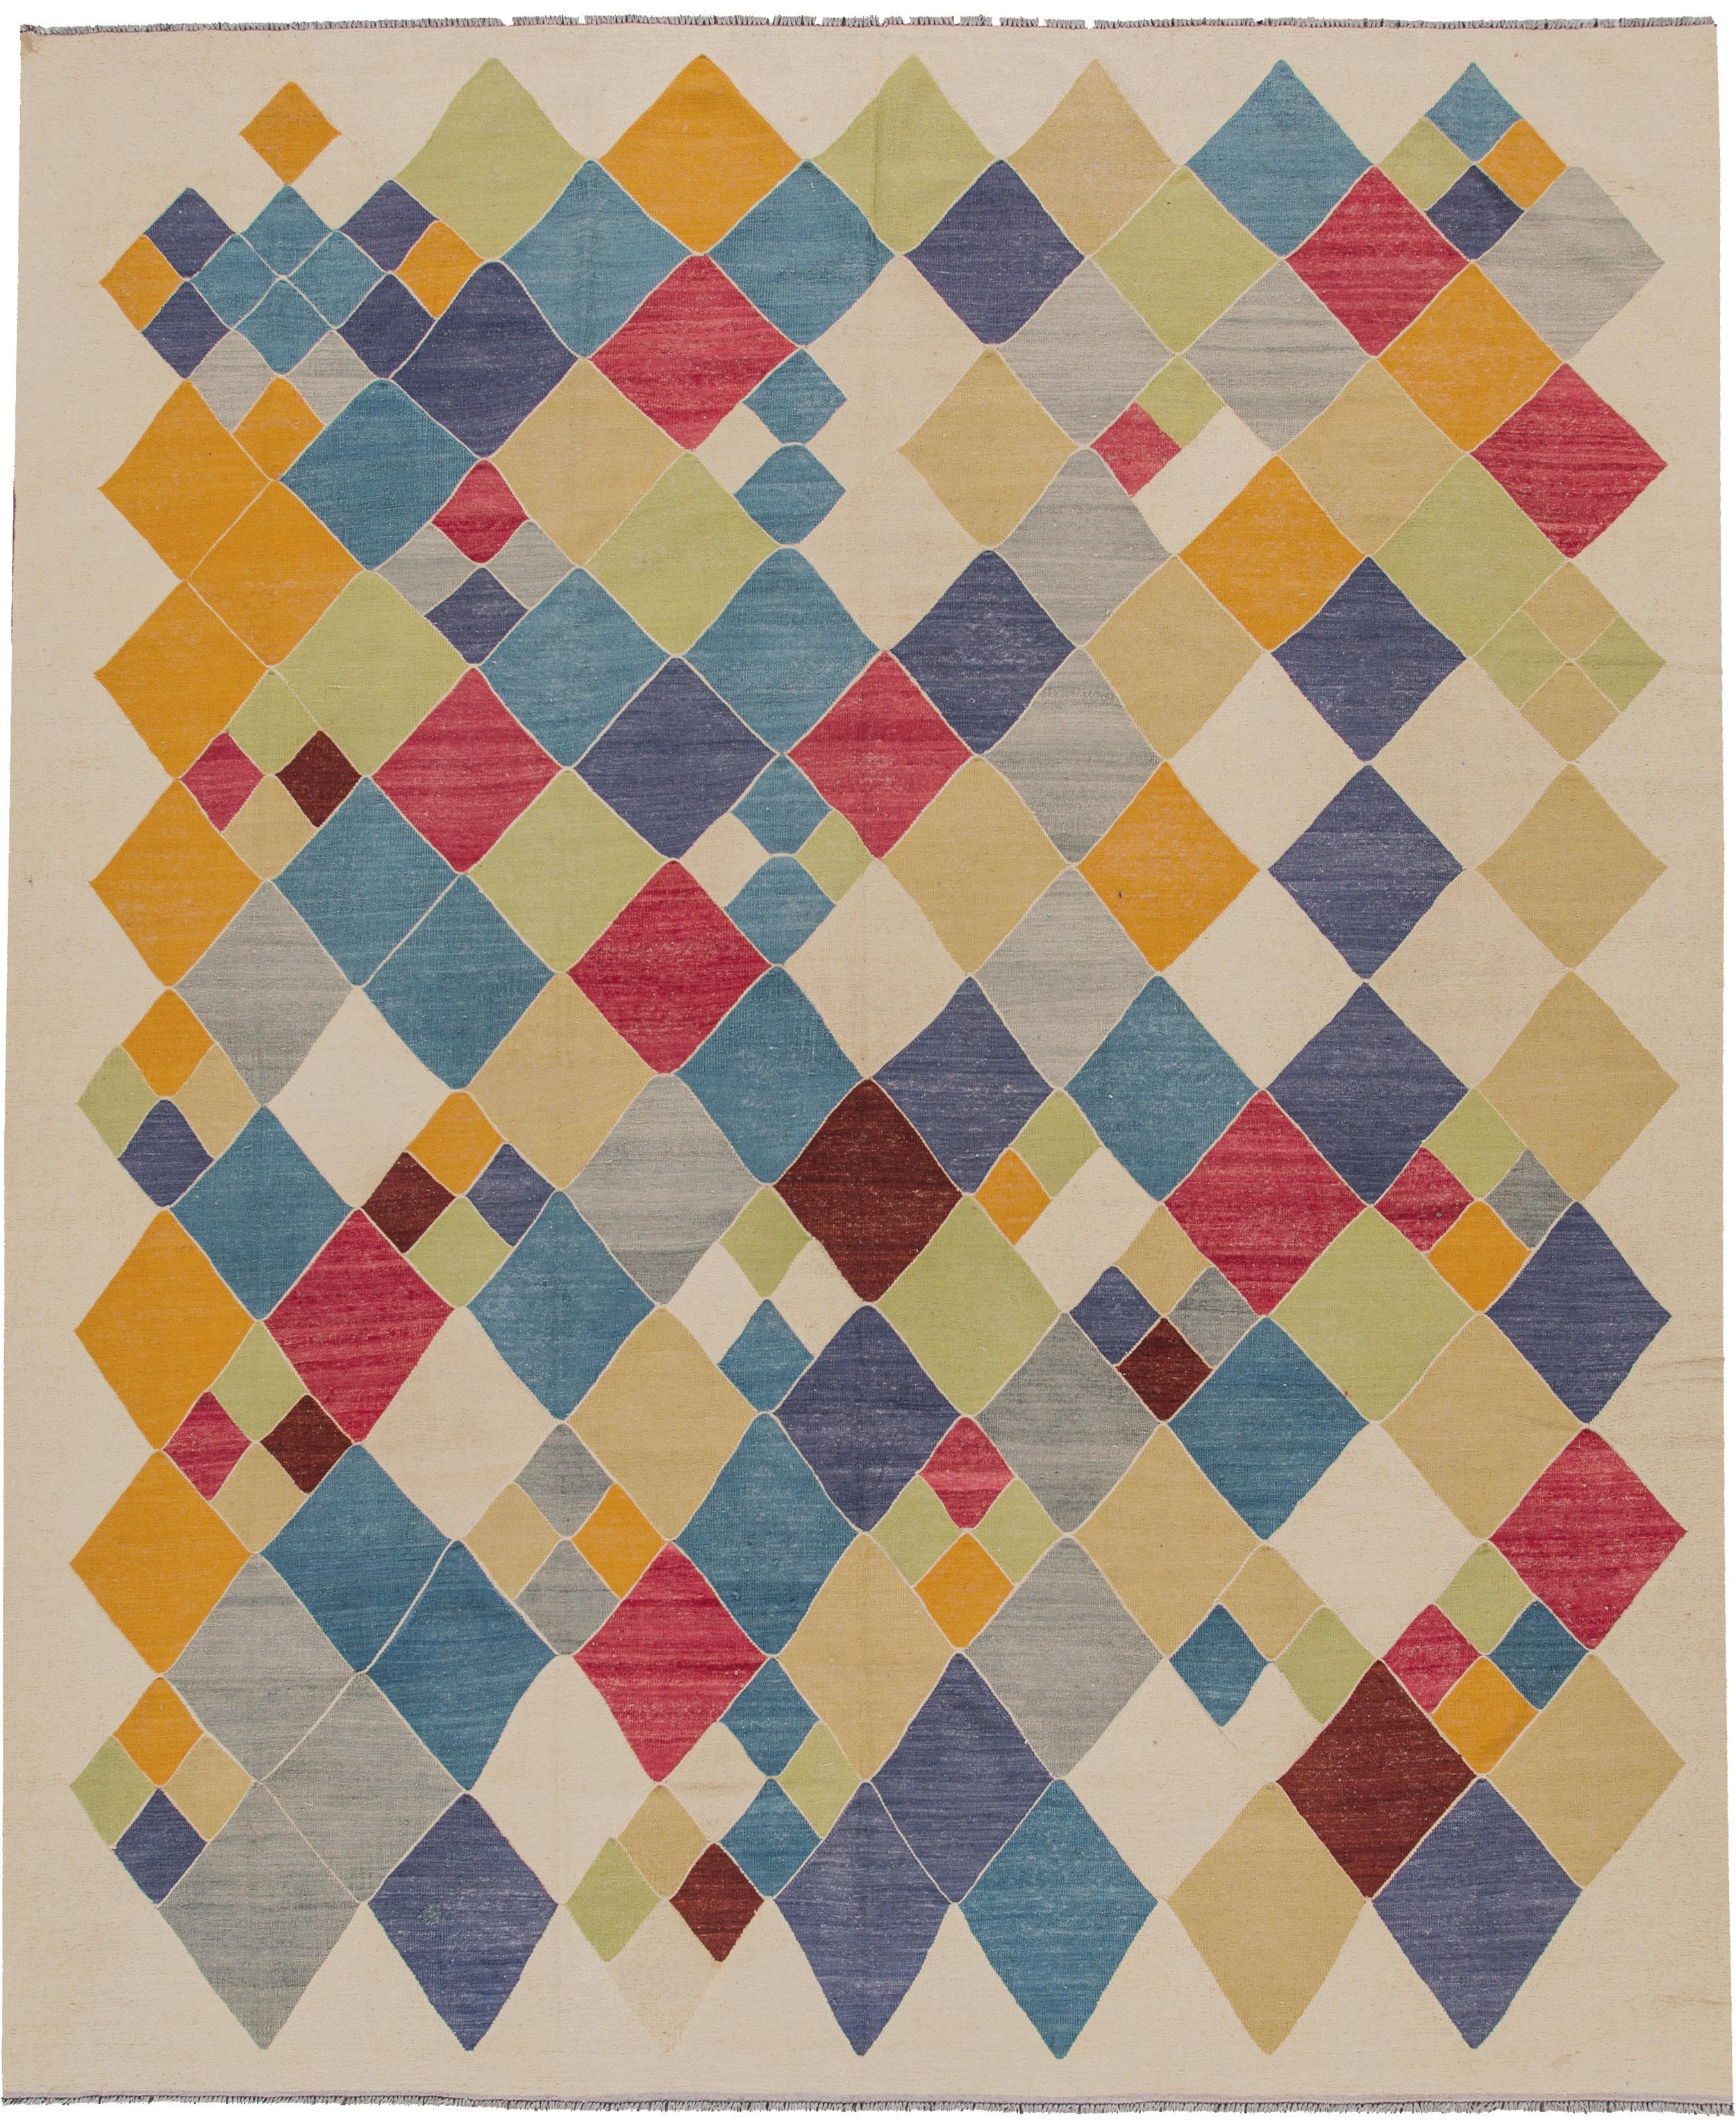 "Clowning Around - Kilim Weave, Multi Checkered100% WoolDimensions: 11'' 01'' x 13' 06""Price: $5,983.00"